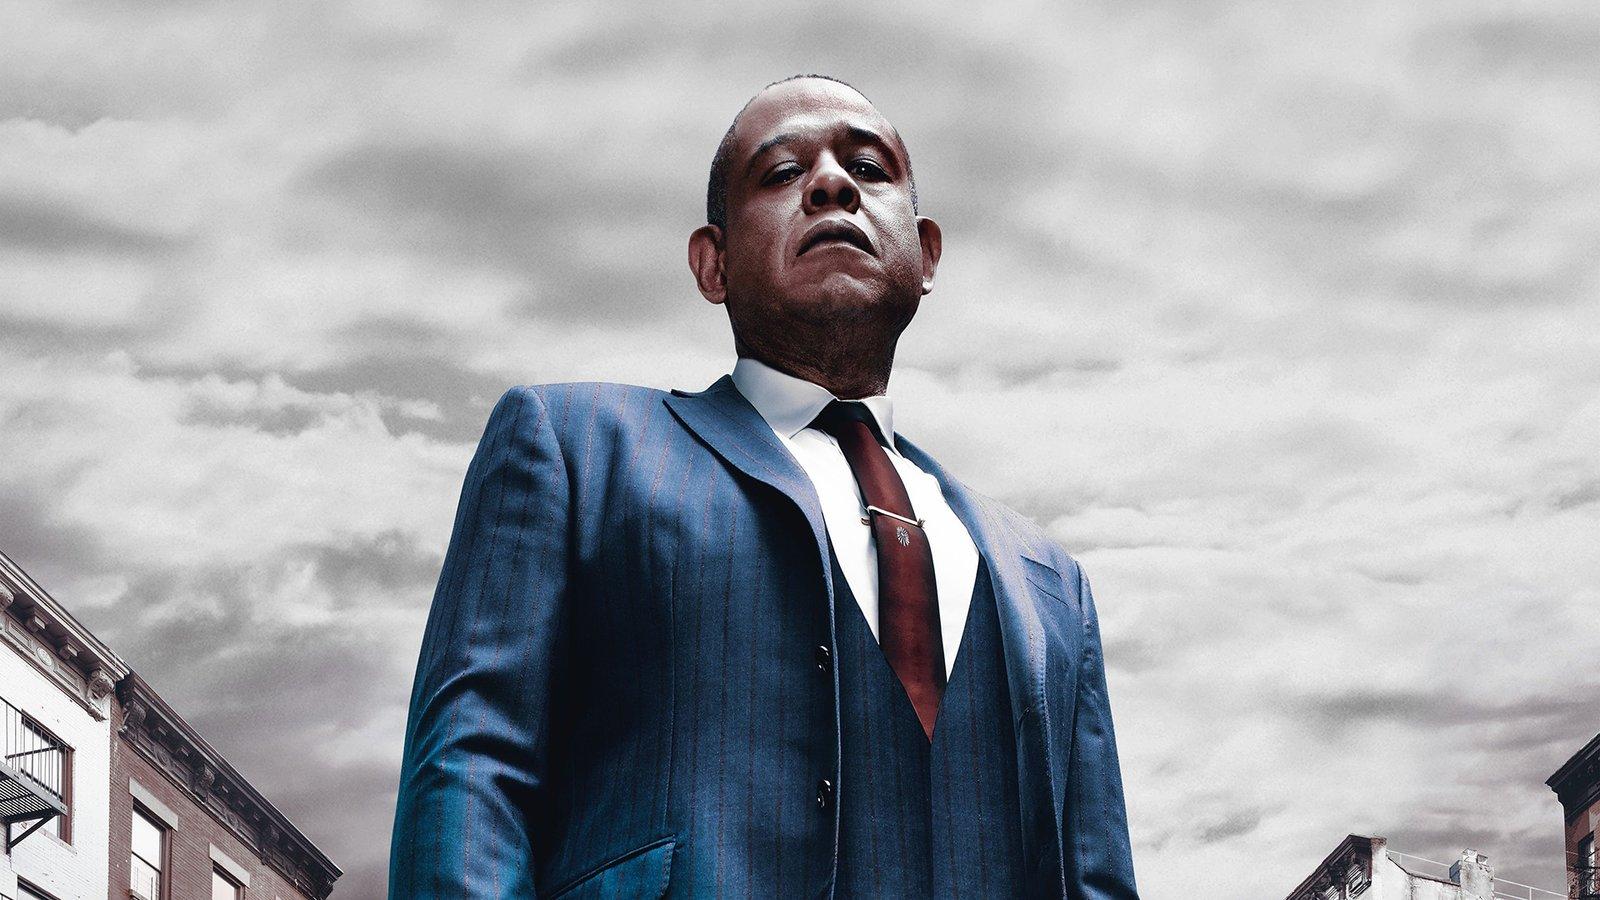 Крёстный отец Гарлема / Godfather of Harlem background